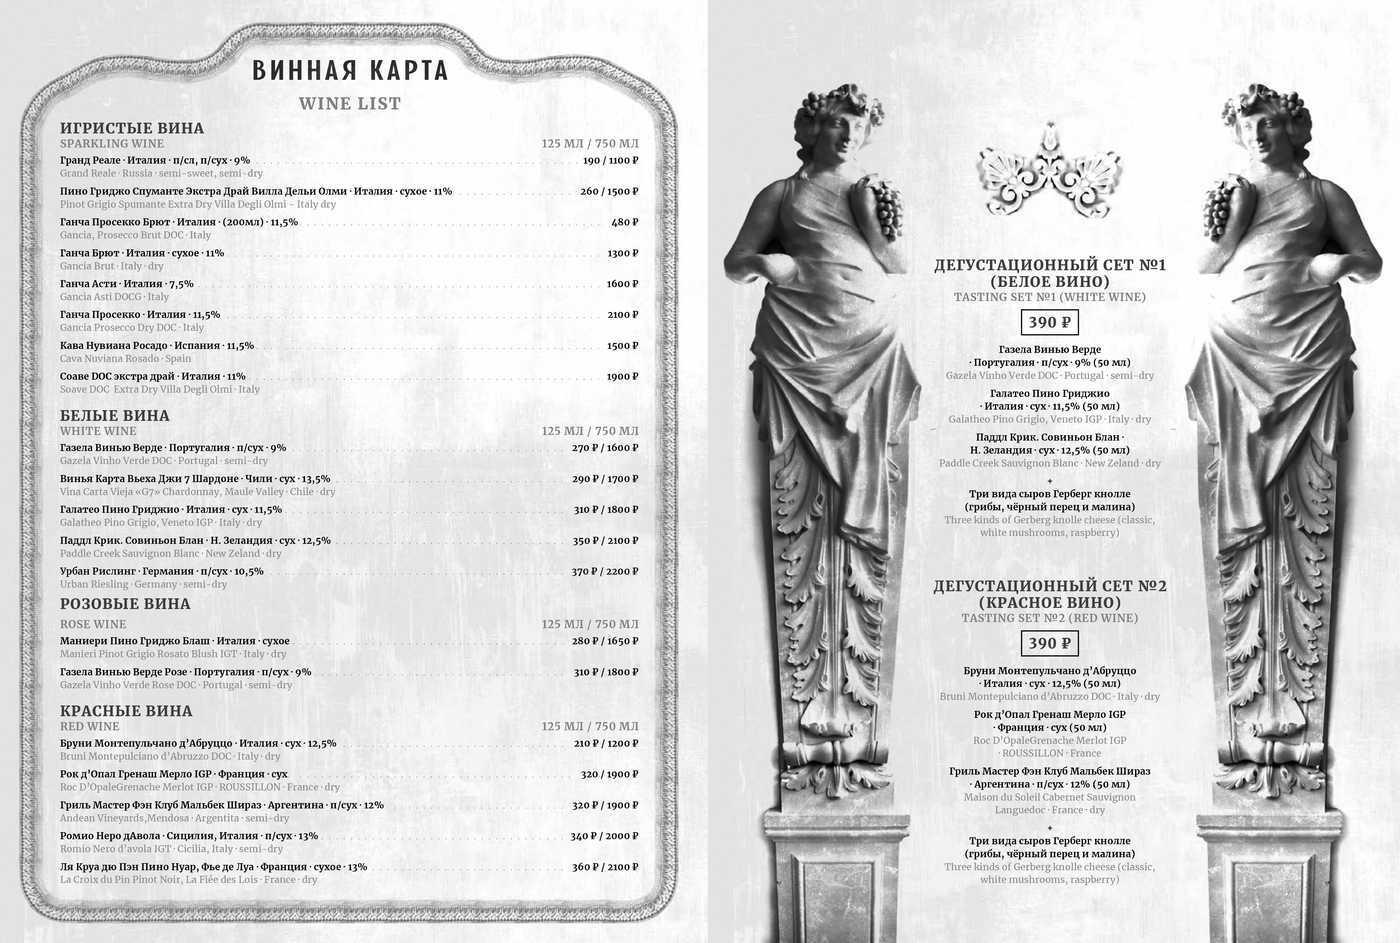 Меню ресторана Шато Винтаж (Chateau Vintage) на Невском проспекте фото 8